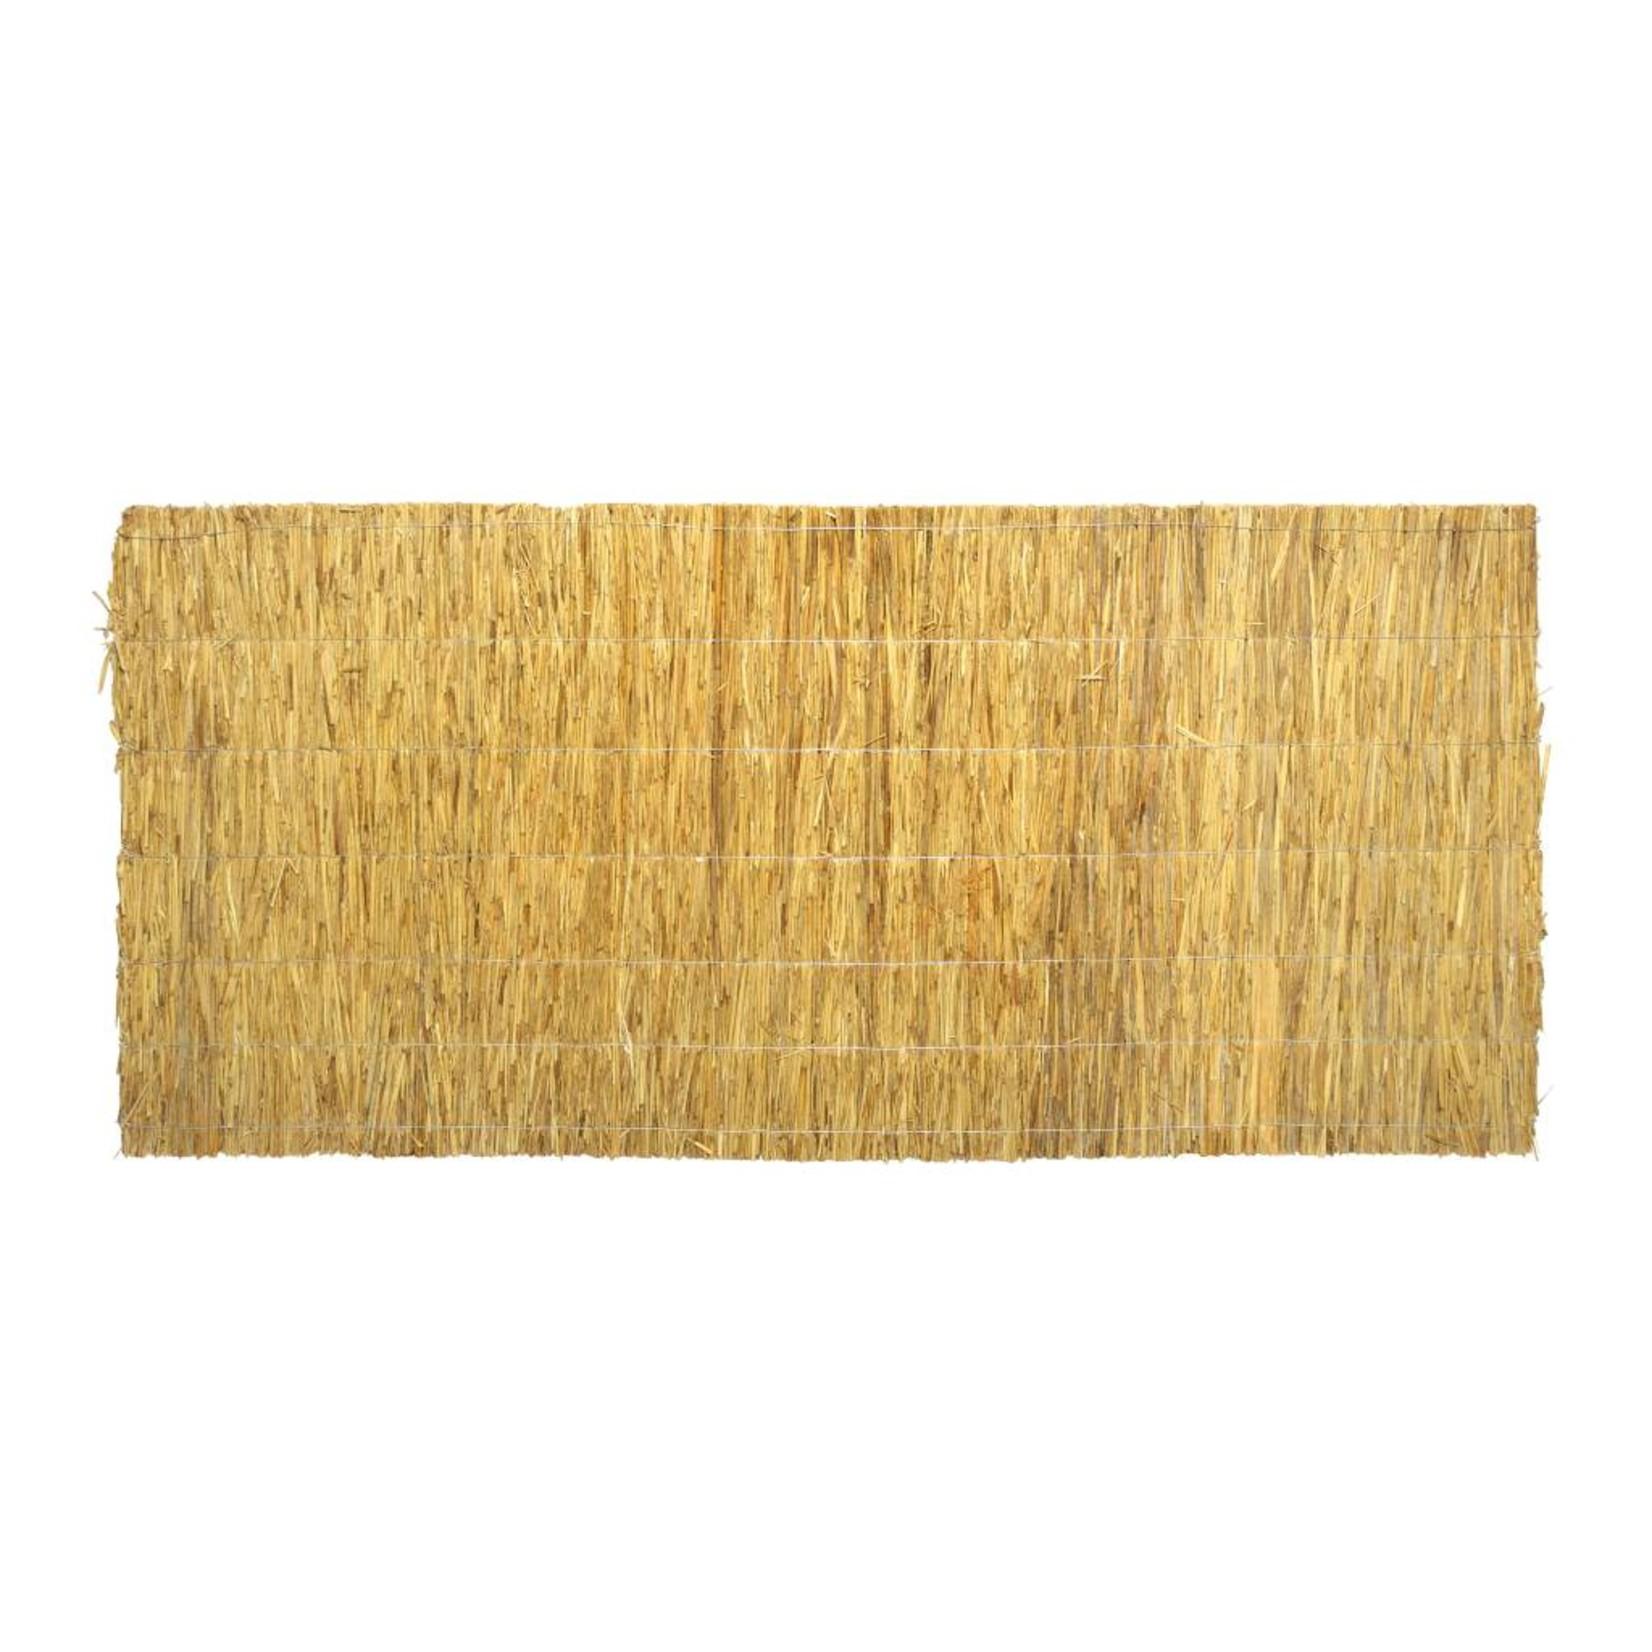 TuinChamp Rietplaat 3 cm dik 180 x 200 cm